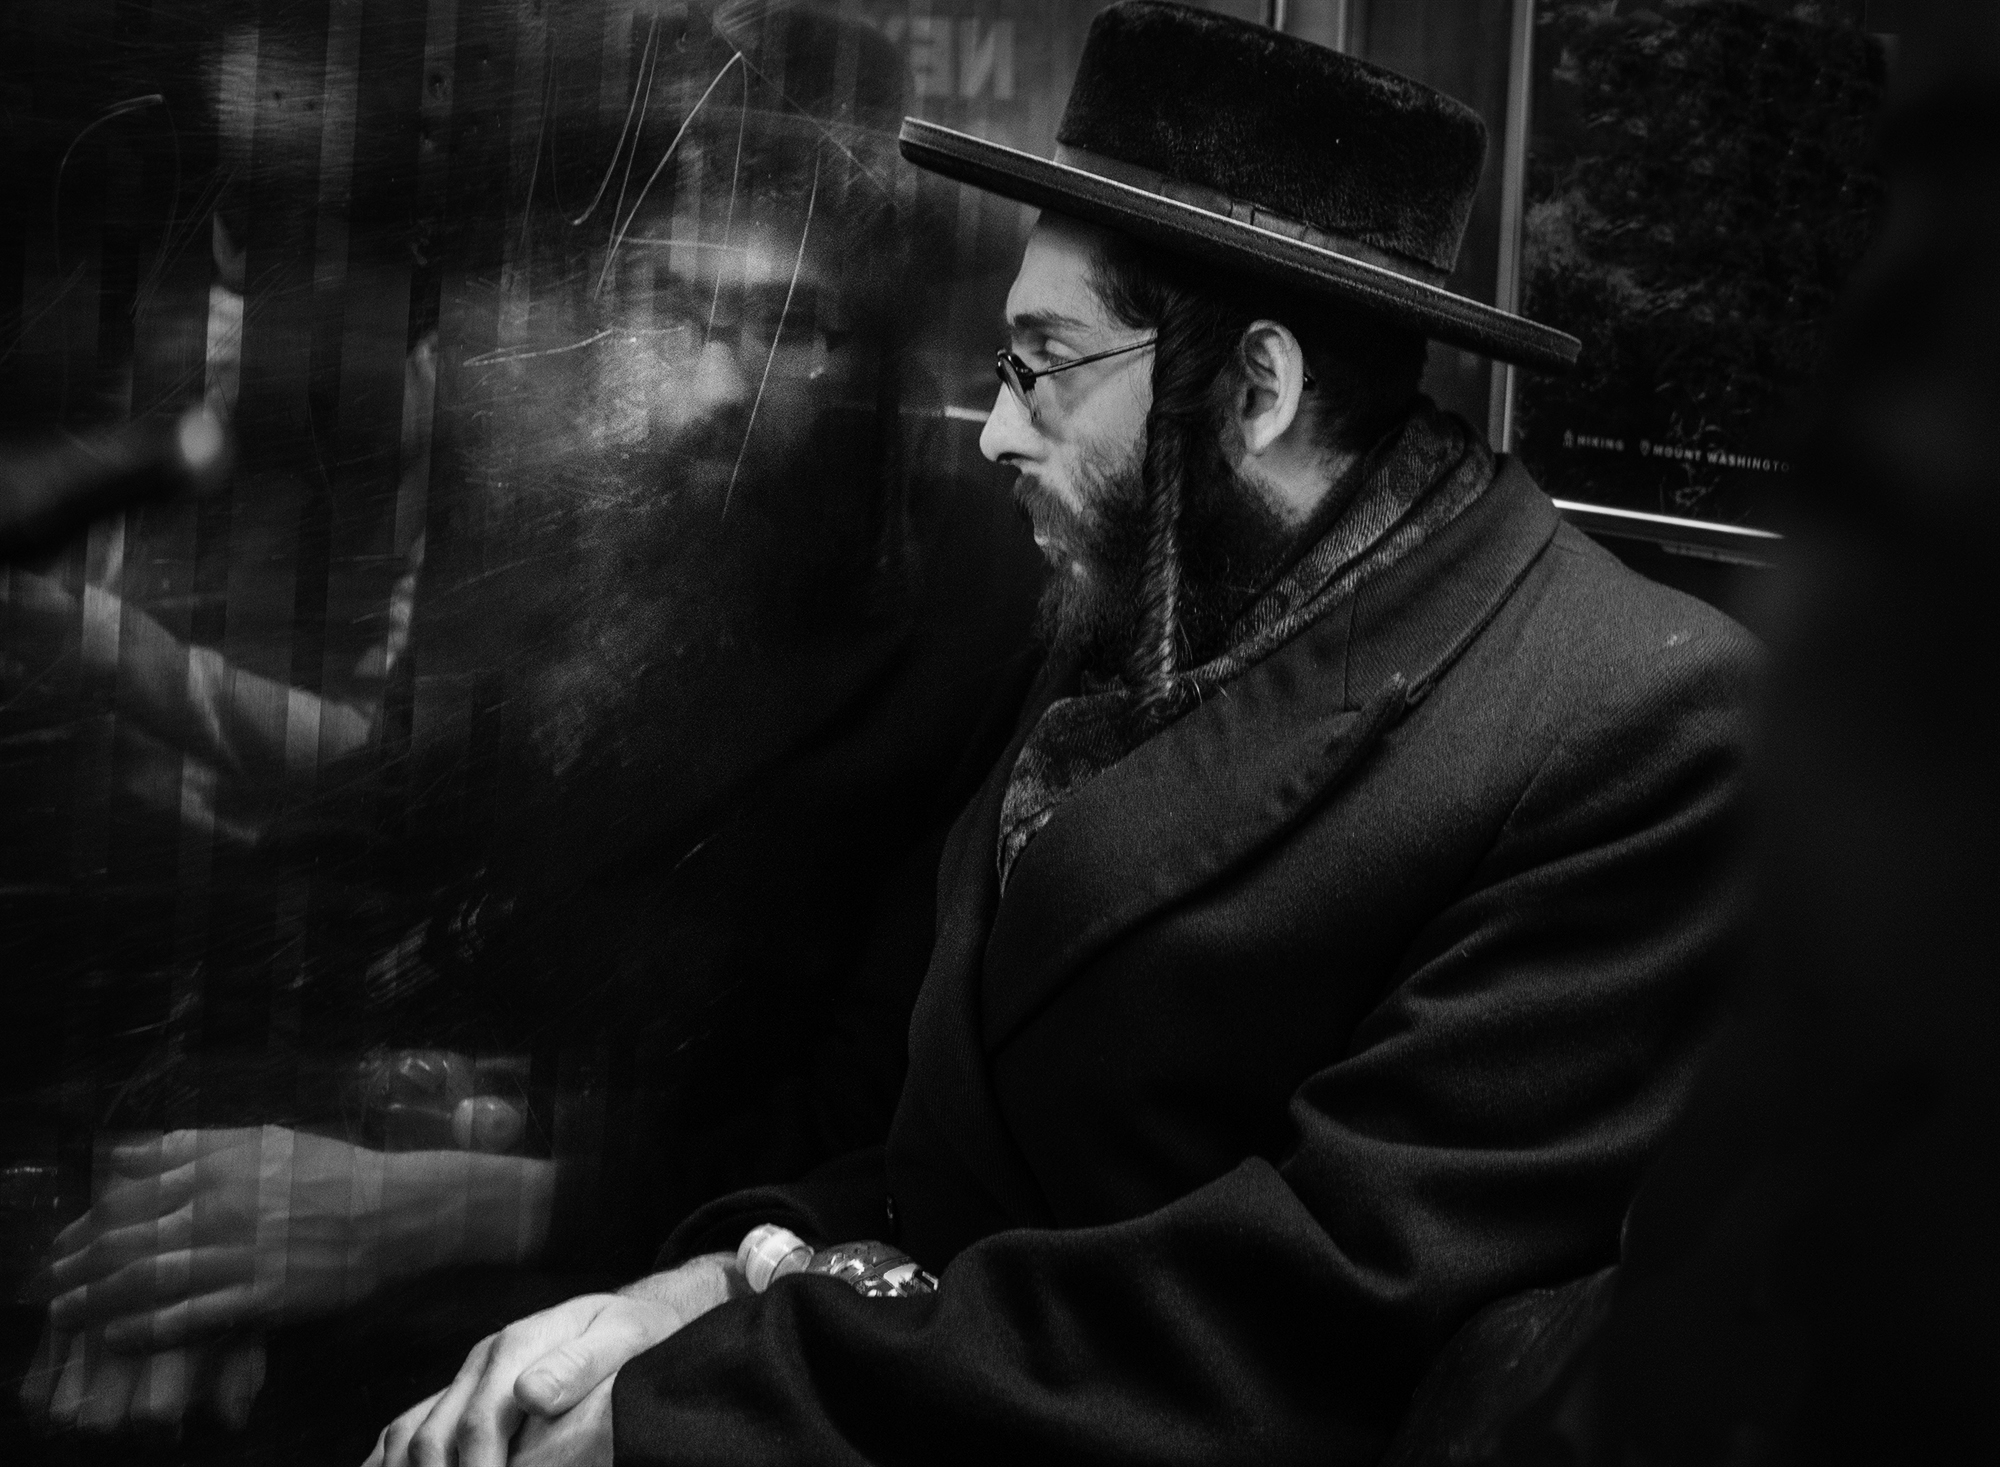 Brklyn_Subway_2018_Hesidic_Man_Reflecting-017crp.jpg